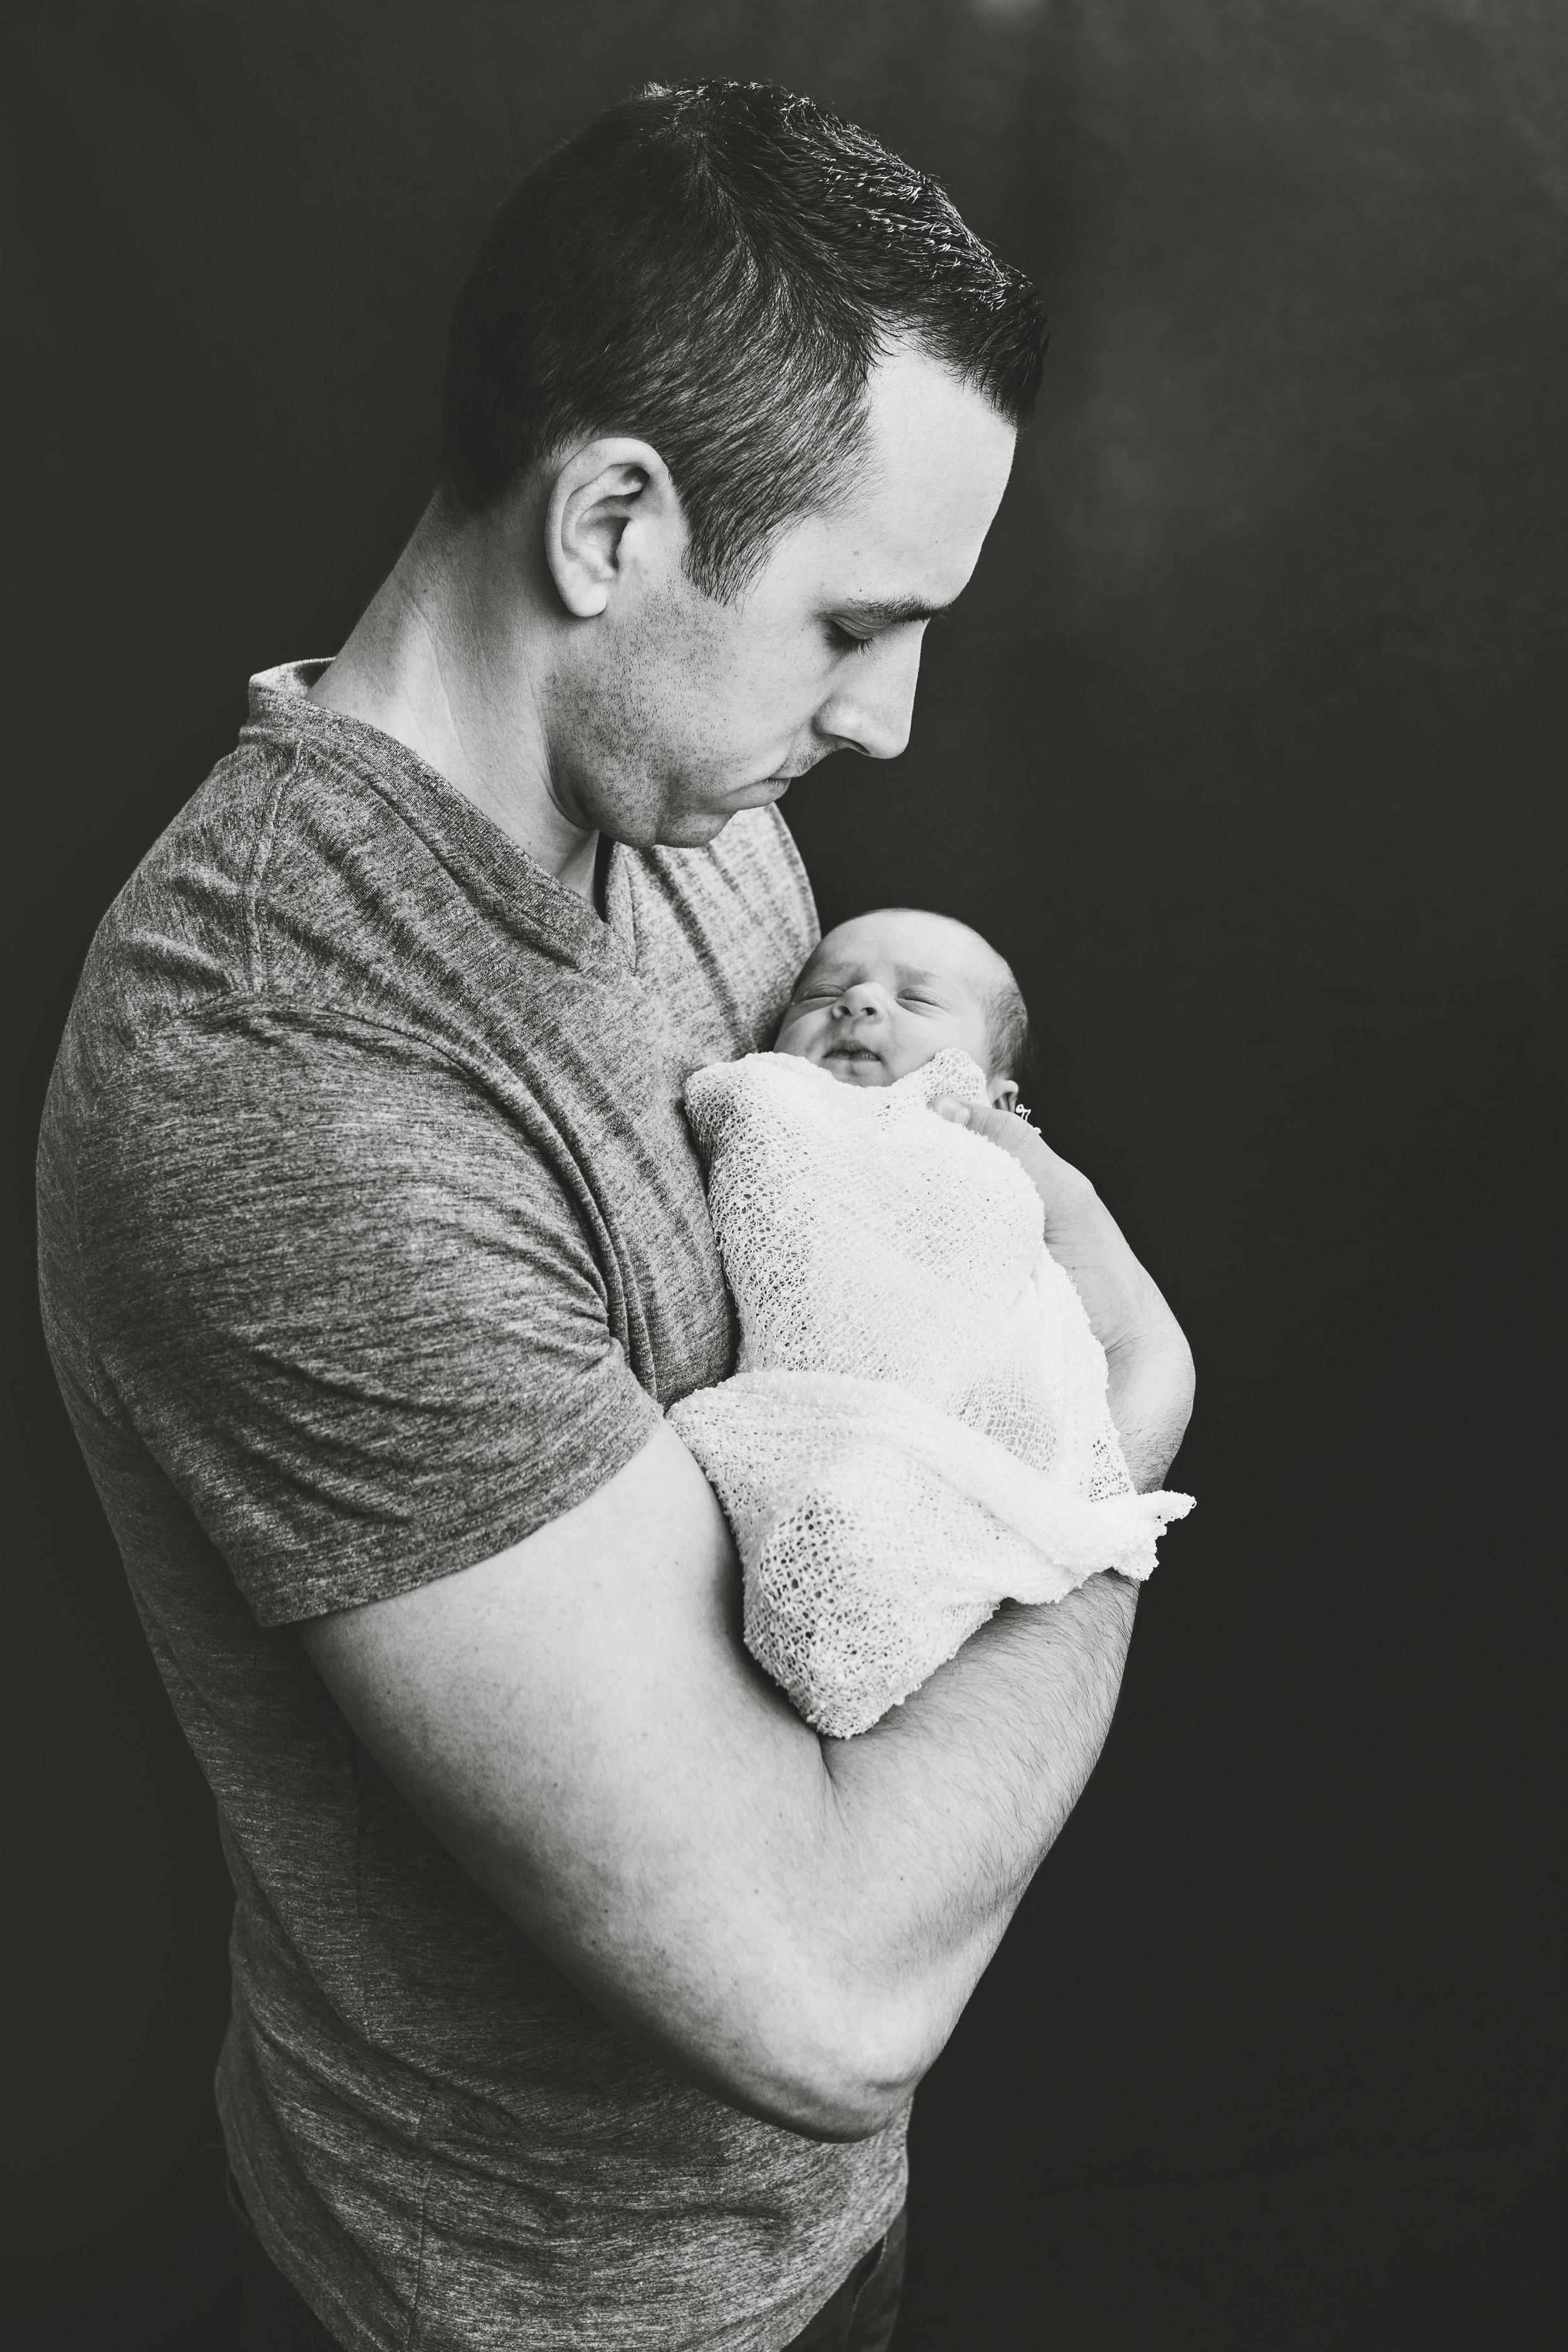 Baby_Cameron-13BW.jpg